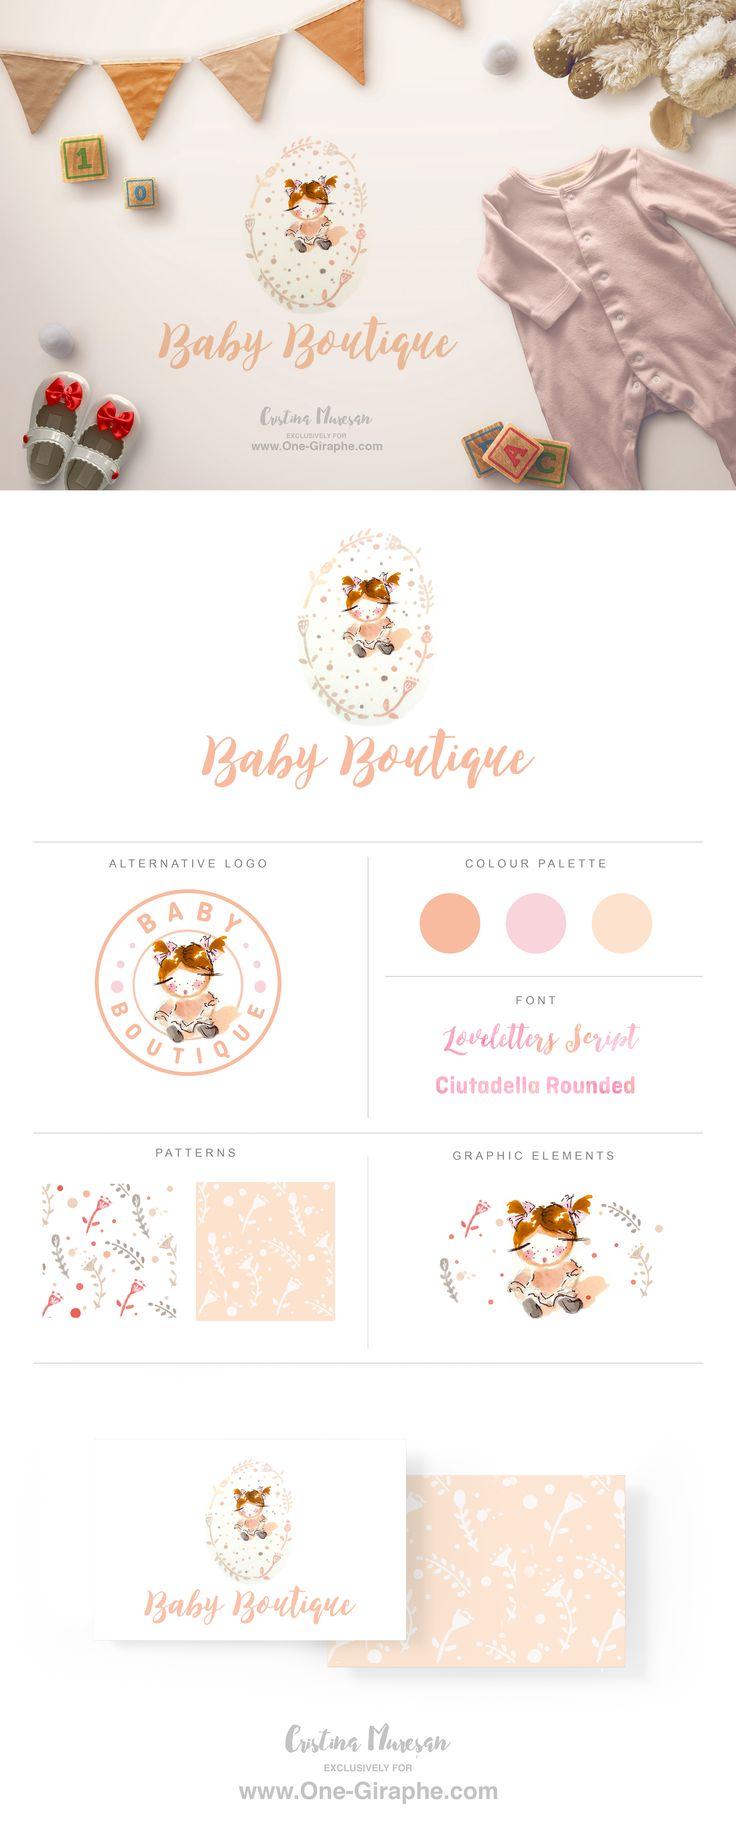 New logo for sale !  Custom Hand Drawn Logo Design in collaboration with artist Cristina Mureșan-Toth  http://www.one-giraphe.com/prev.php?c=193  #logo #baby #logodesign #logos #readymade #etsy #etsyseller #kids #children #store #onegiraphe #designer #graphic #brandidentity #cute #sweet #logos #sale